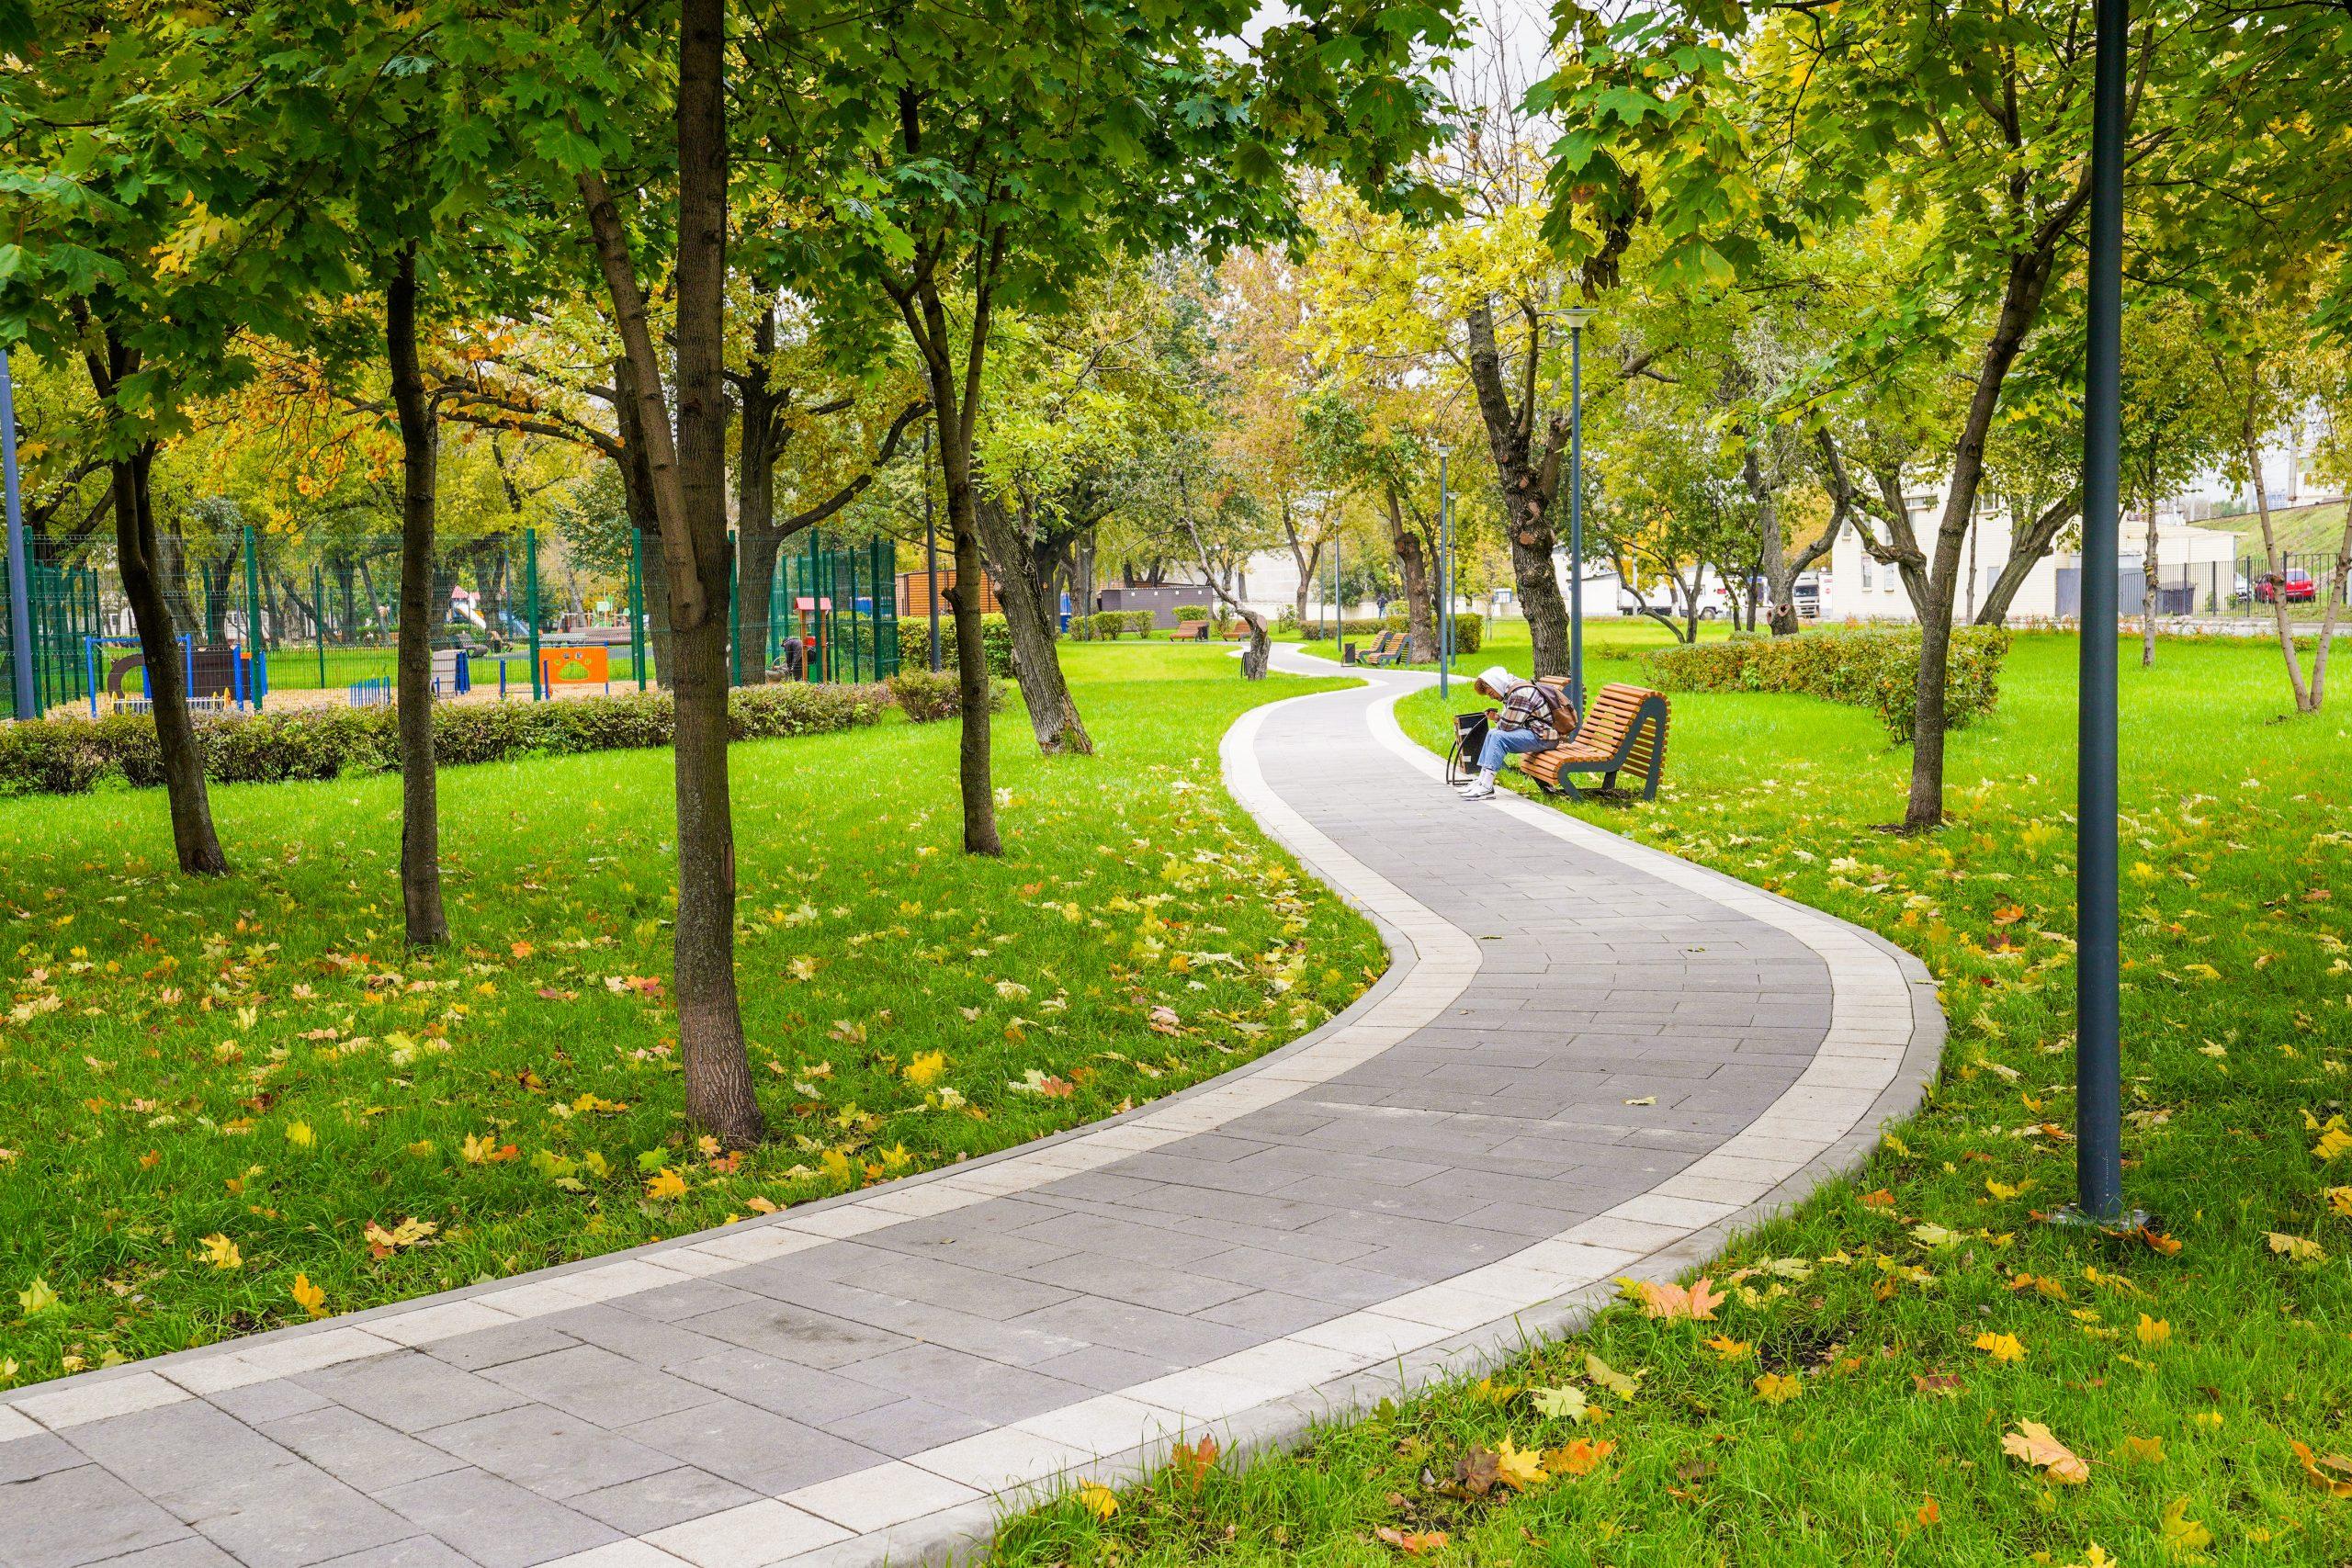 парк Карачарово, дорожка, благоустройство